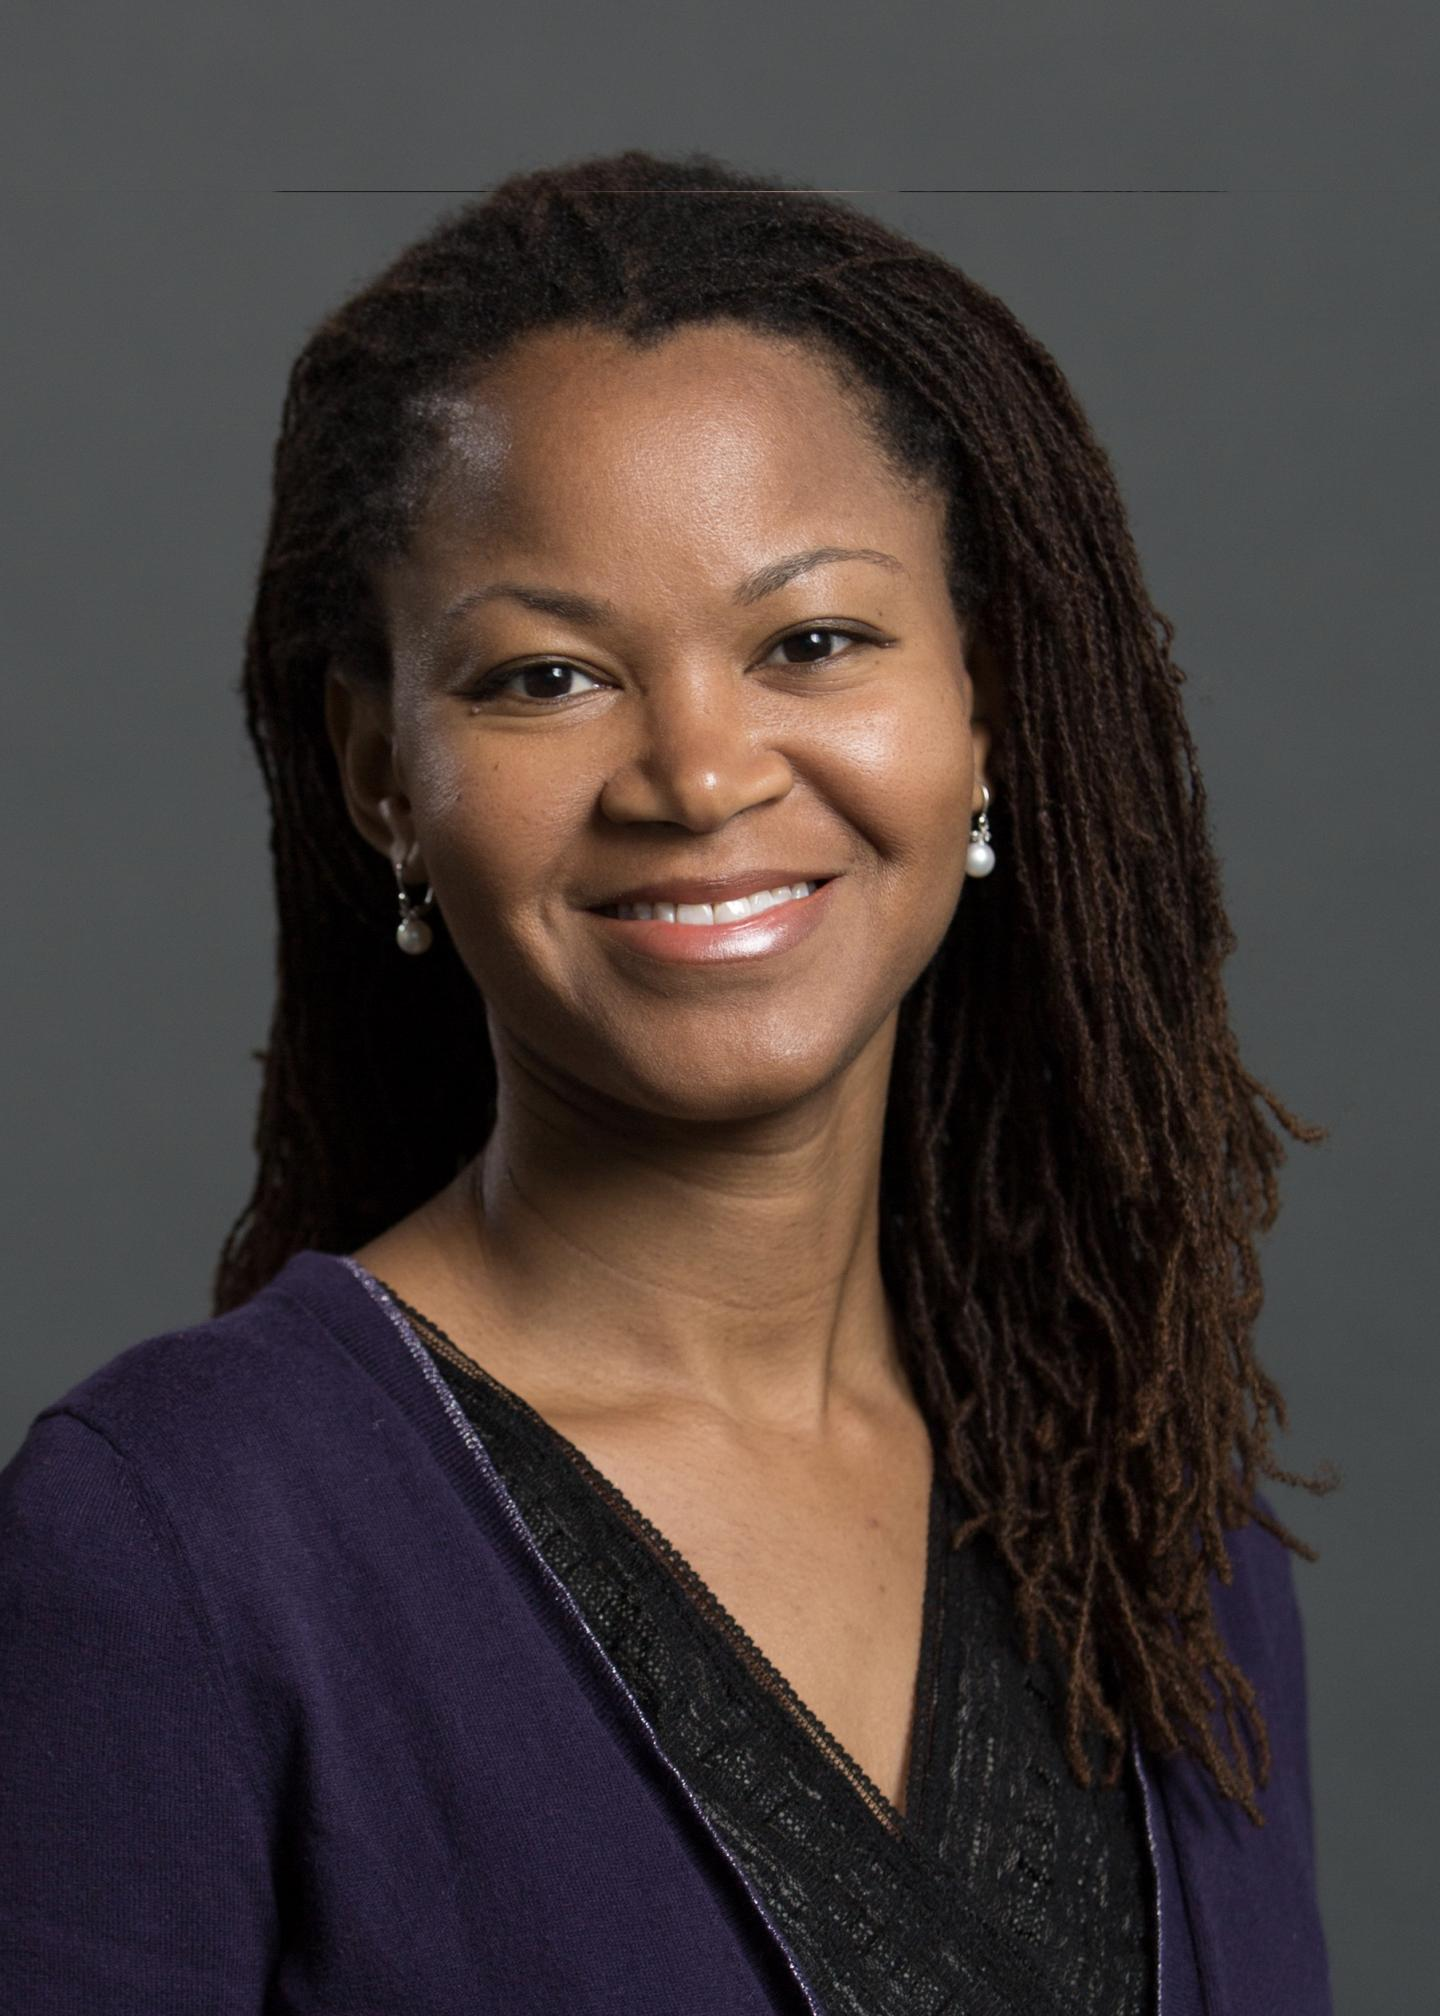 Johanne Eliacin, Ph.D., Indiana University